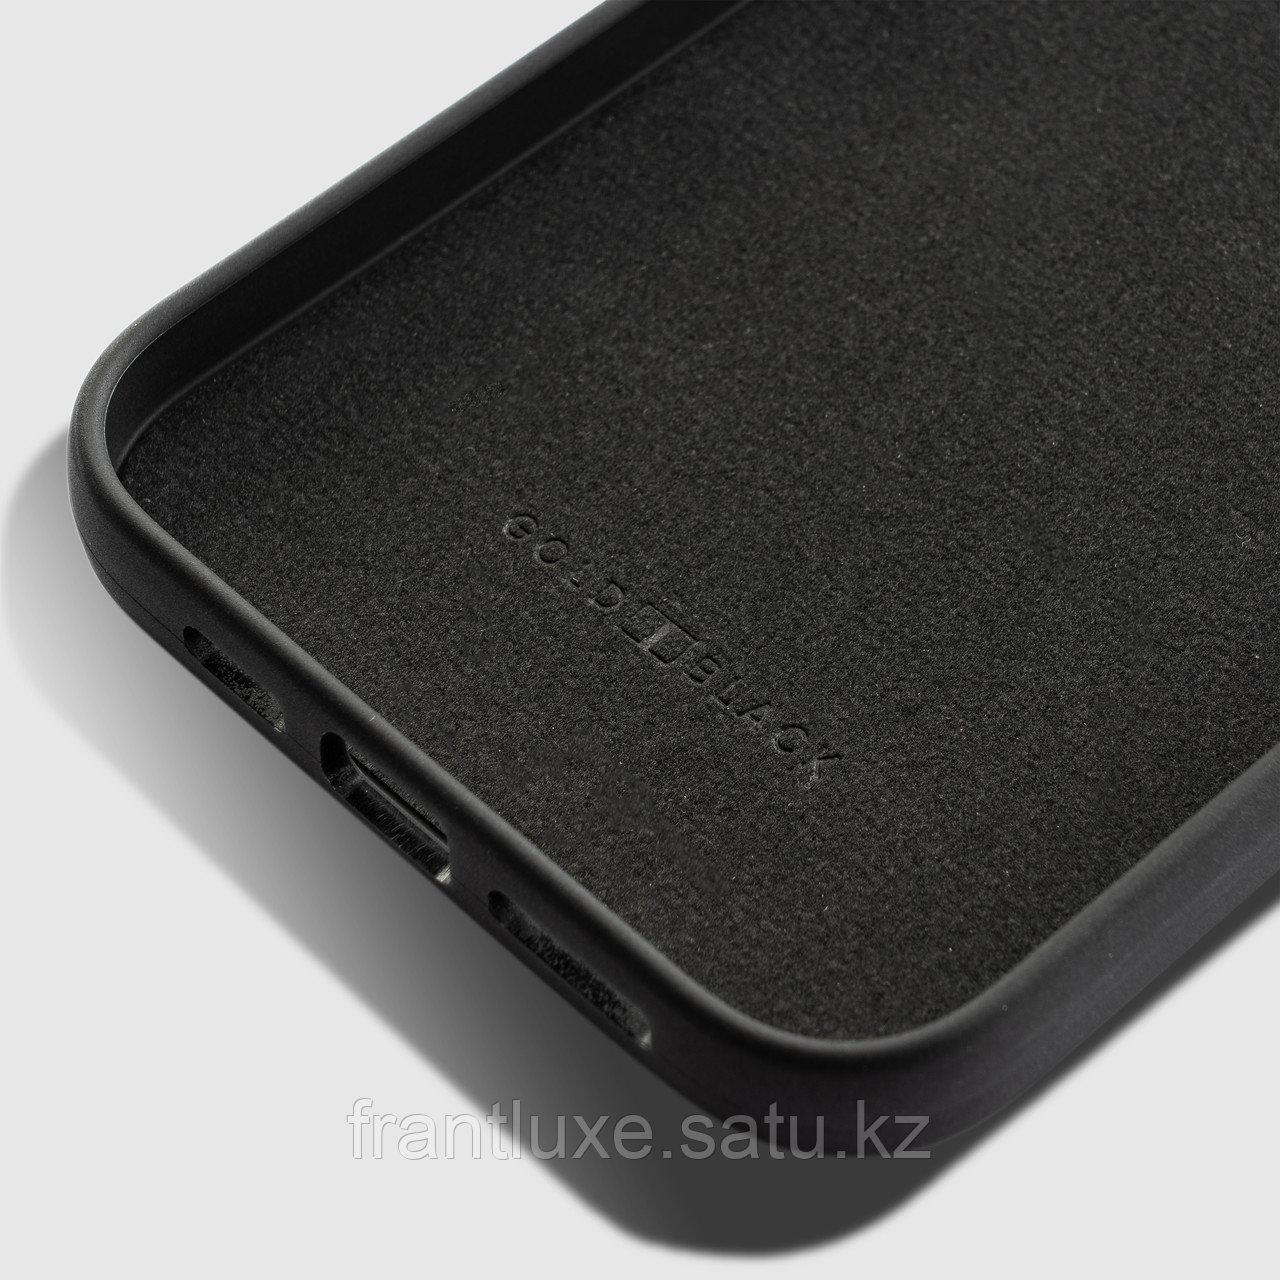 Чехол для телефона iPhone 12 Pro Max серый - фото 2